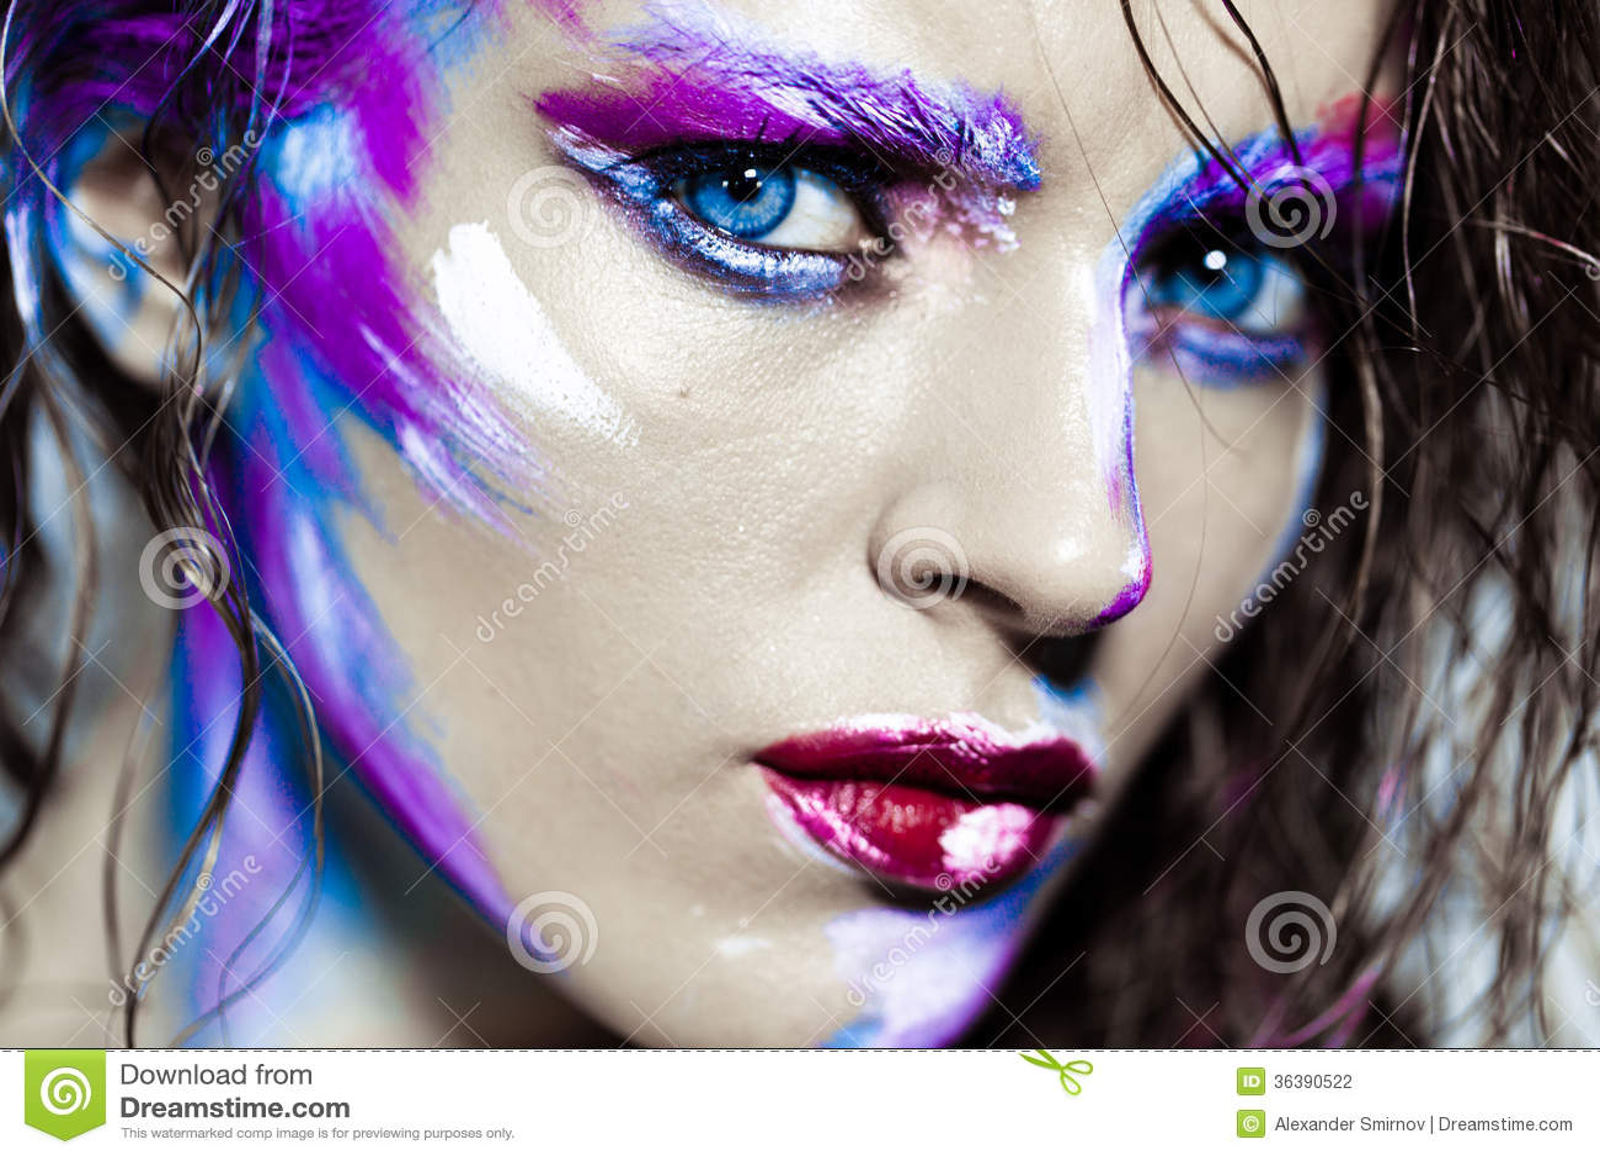 Face Paint Fashion Style